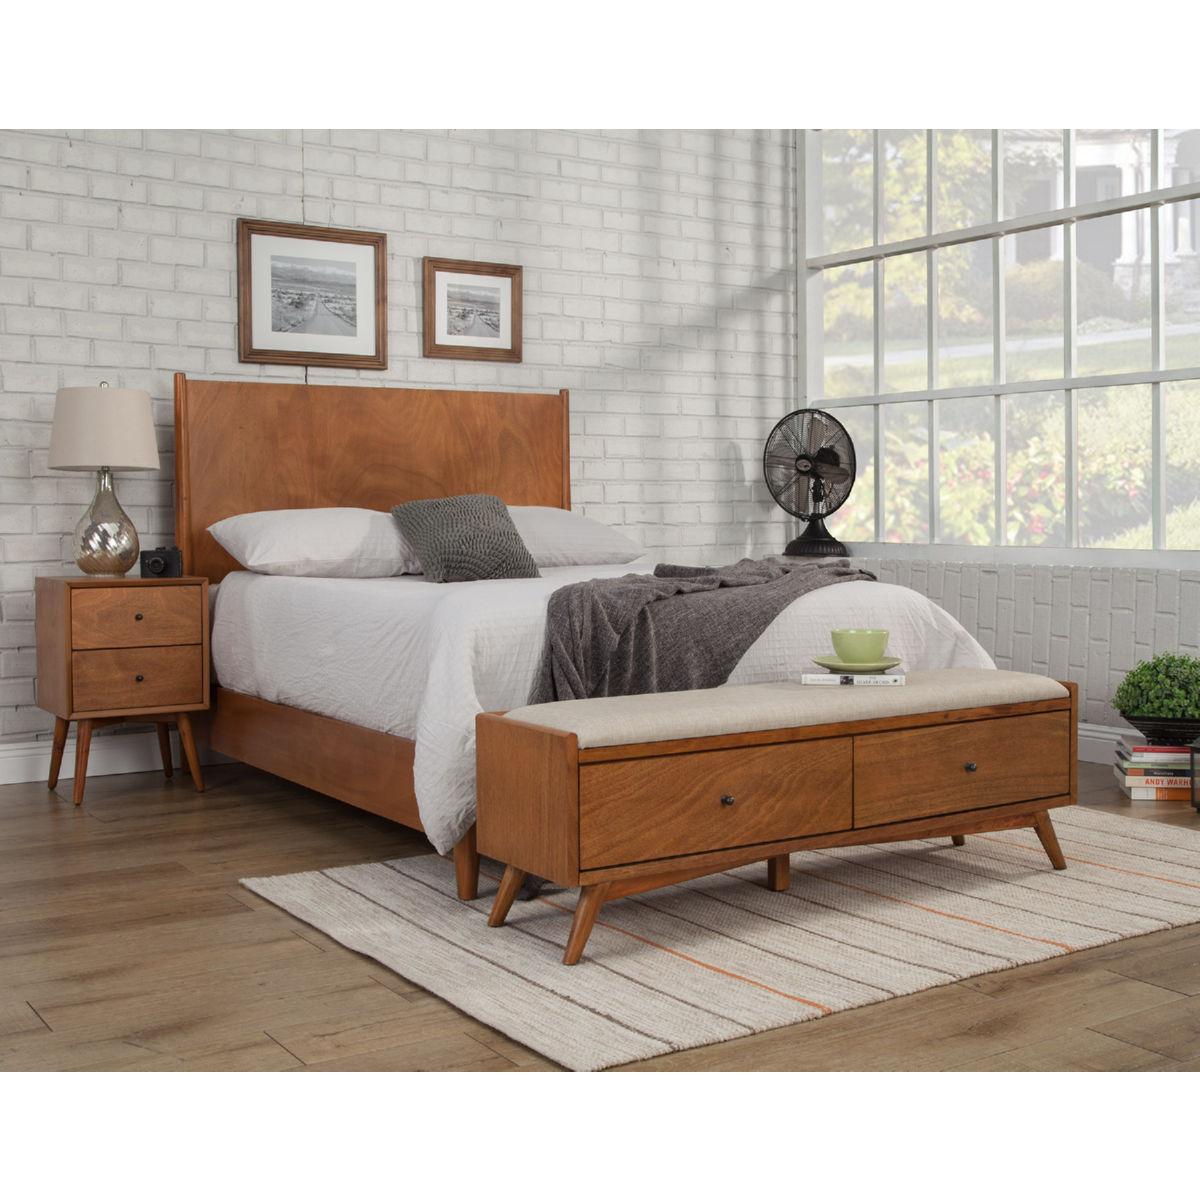 Alpine furniture 966 12 flynn bench in acorn brown finish